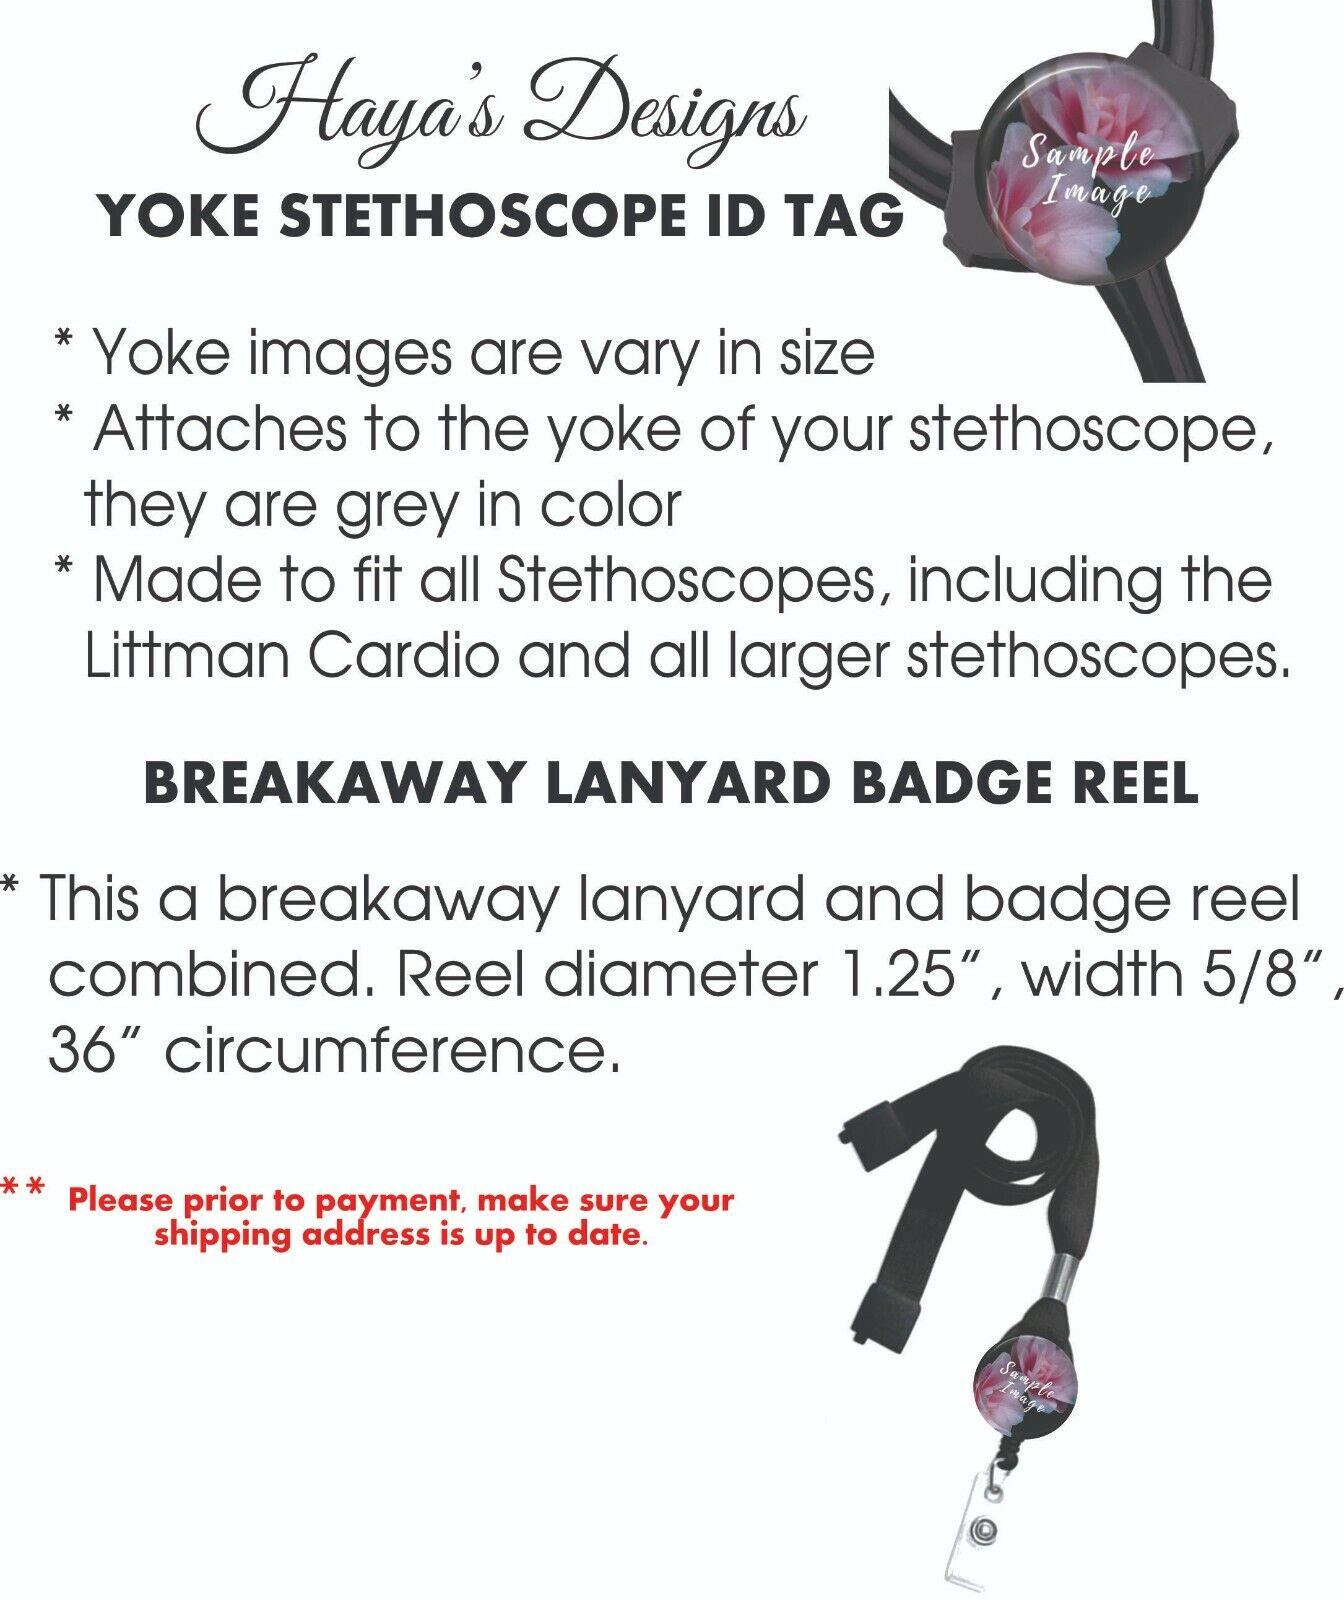 Balloon Character Badge Reel, Retractable ID Badge, Stethoscope ID Tag